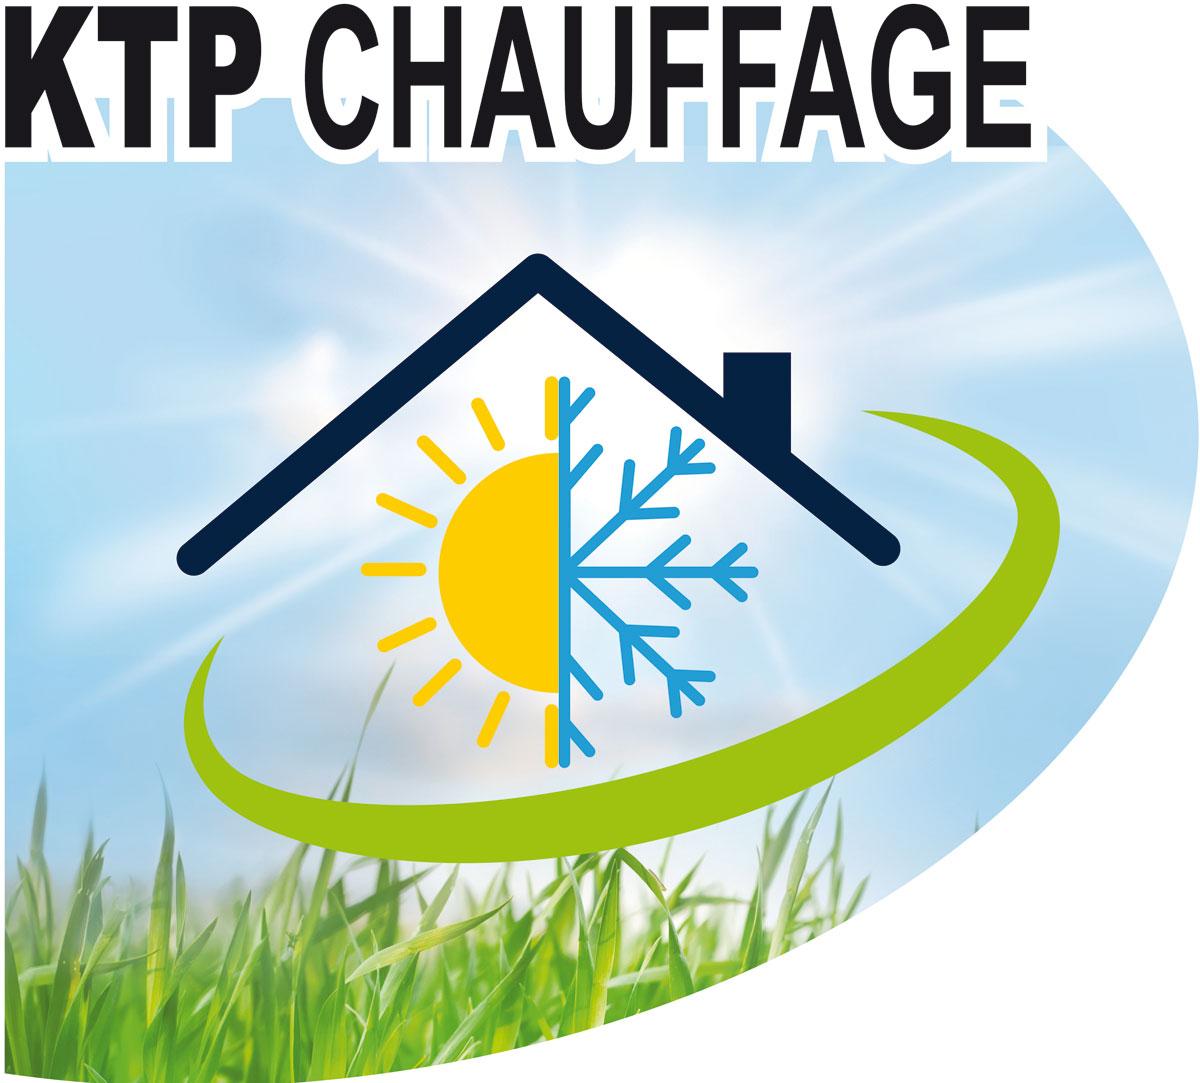 KTP Chauffage